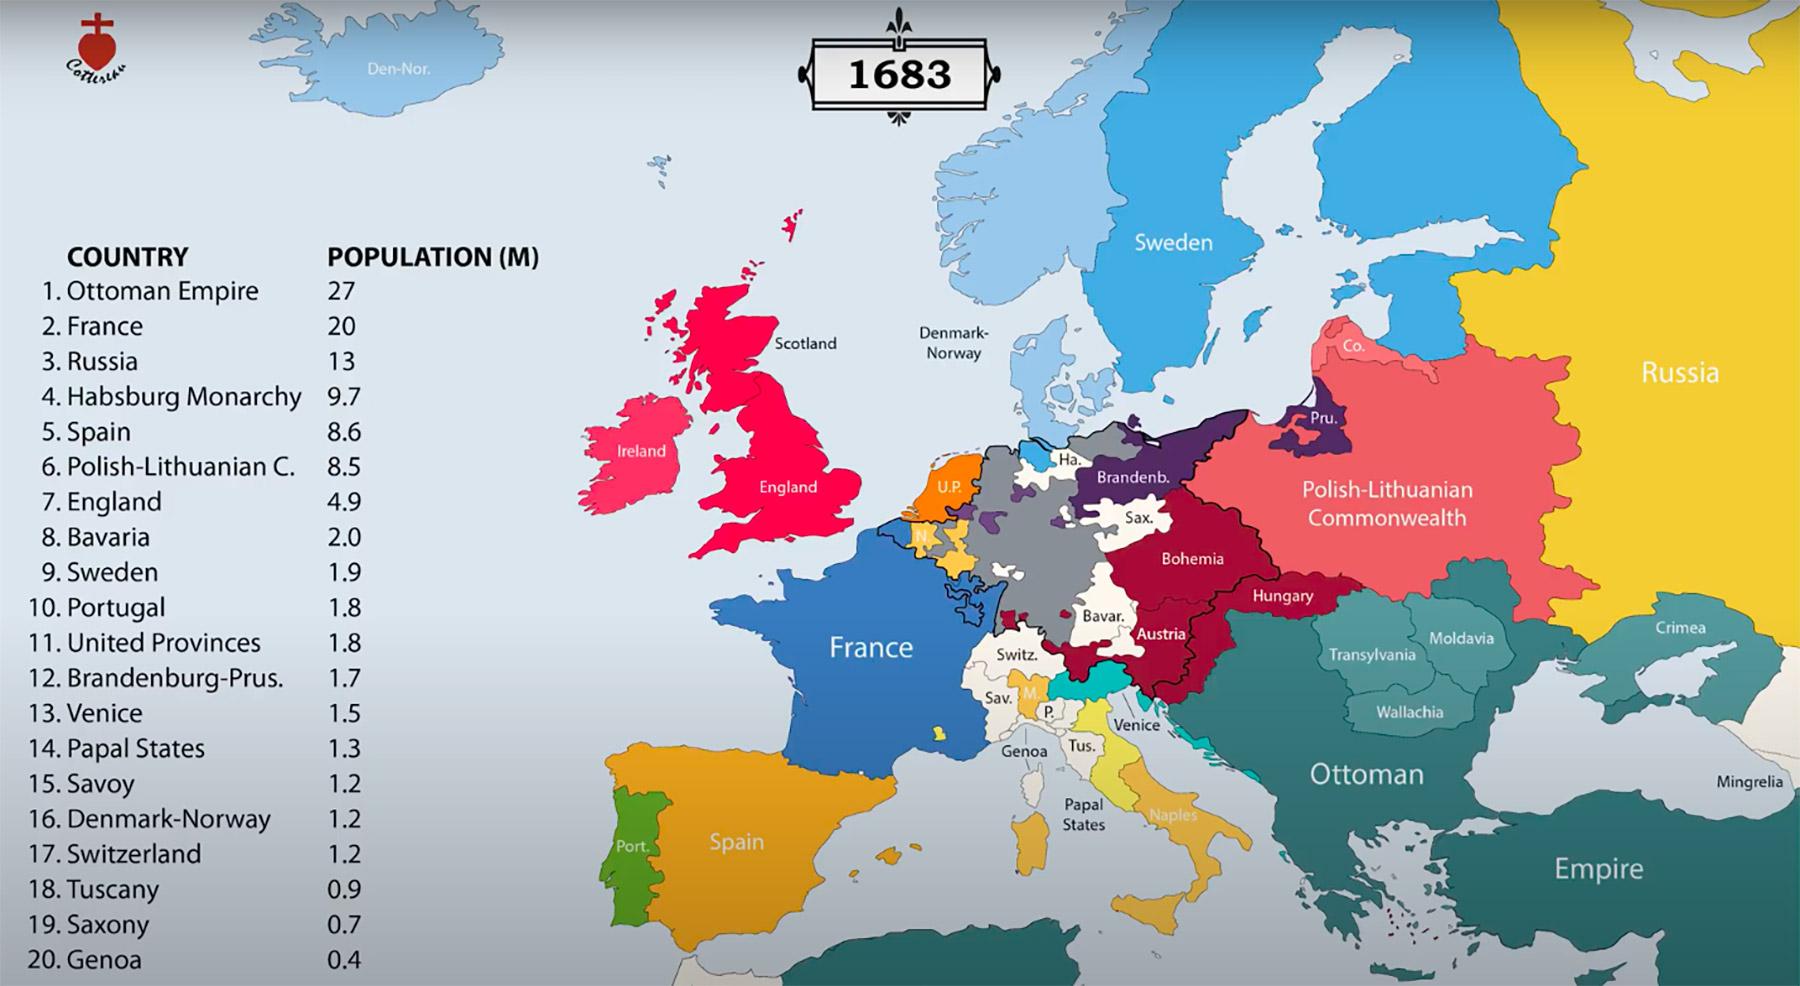 Carte de l'Europe en 1683